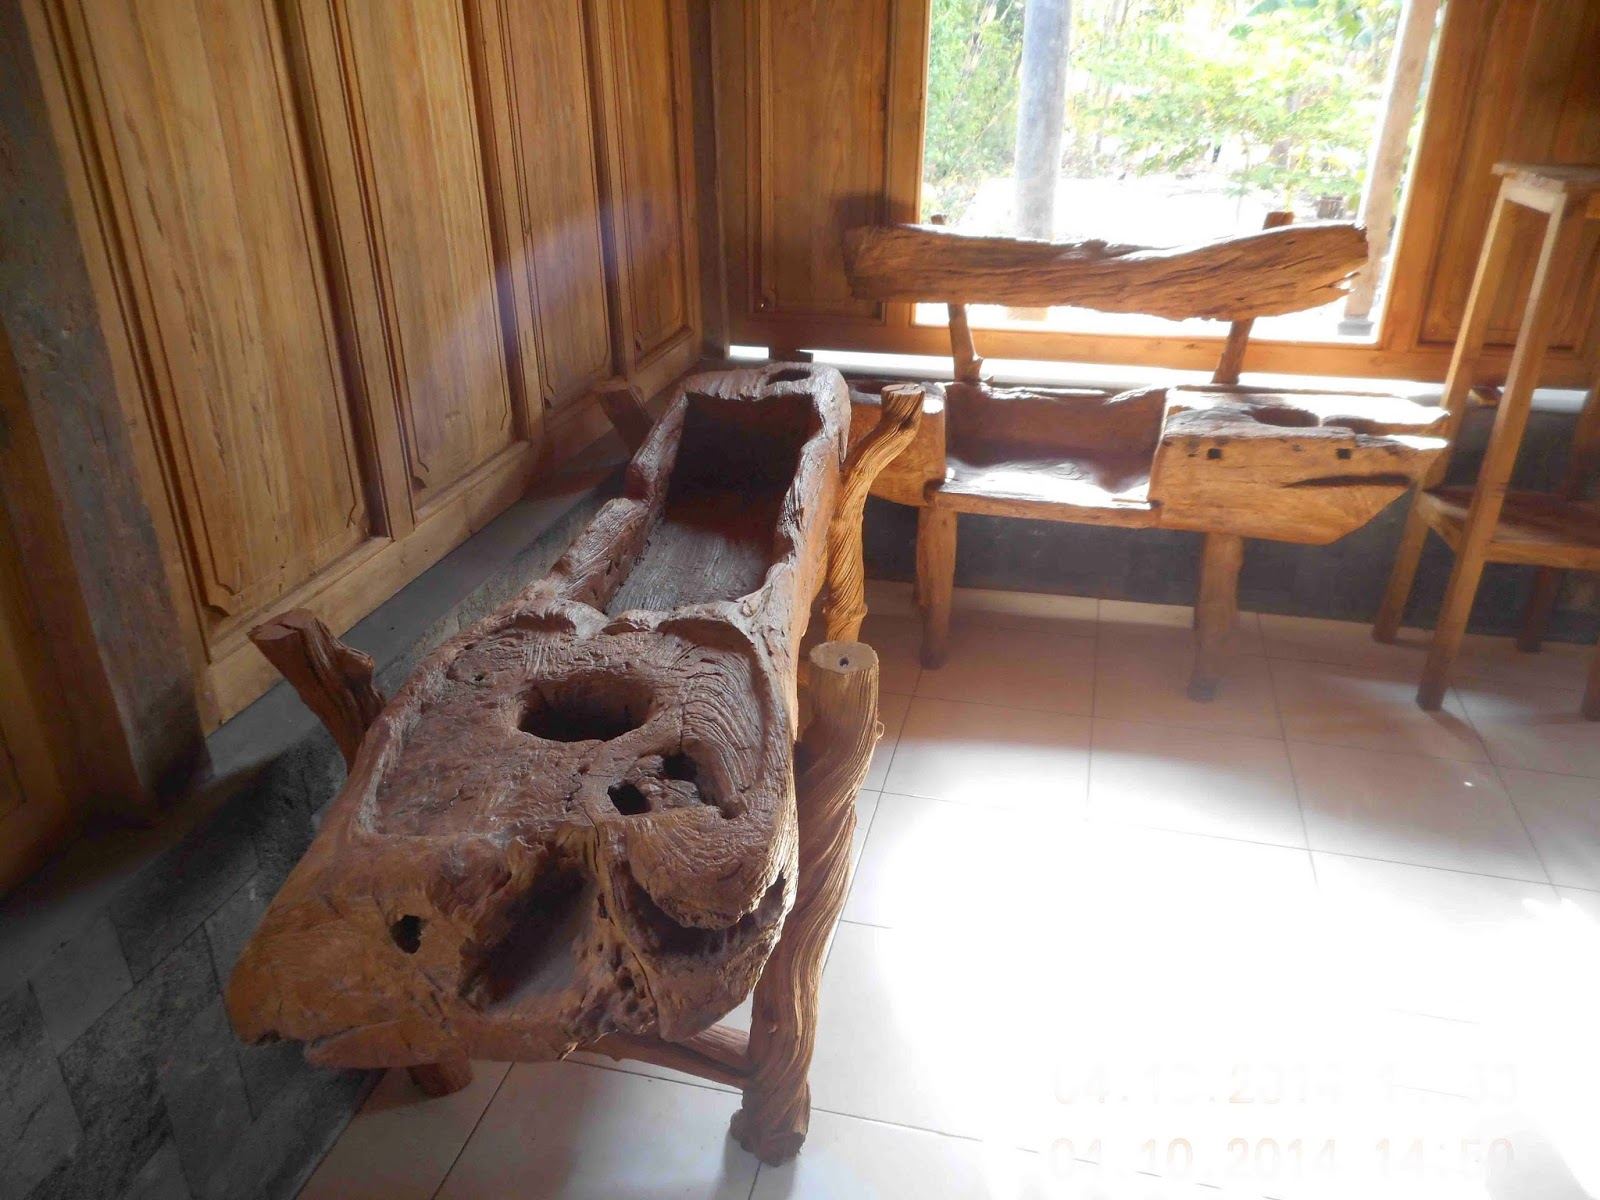 lesung. Kami menjual perabotan antik dari kayu kuno ... & Rumah Kayu Jati Joglo Dan Limasan Jawa Kuno